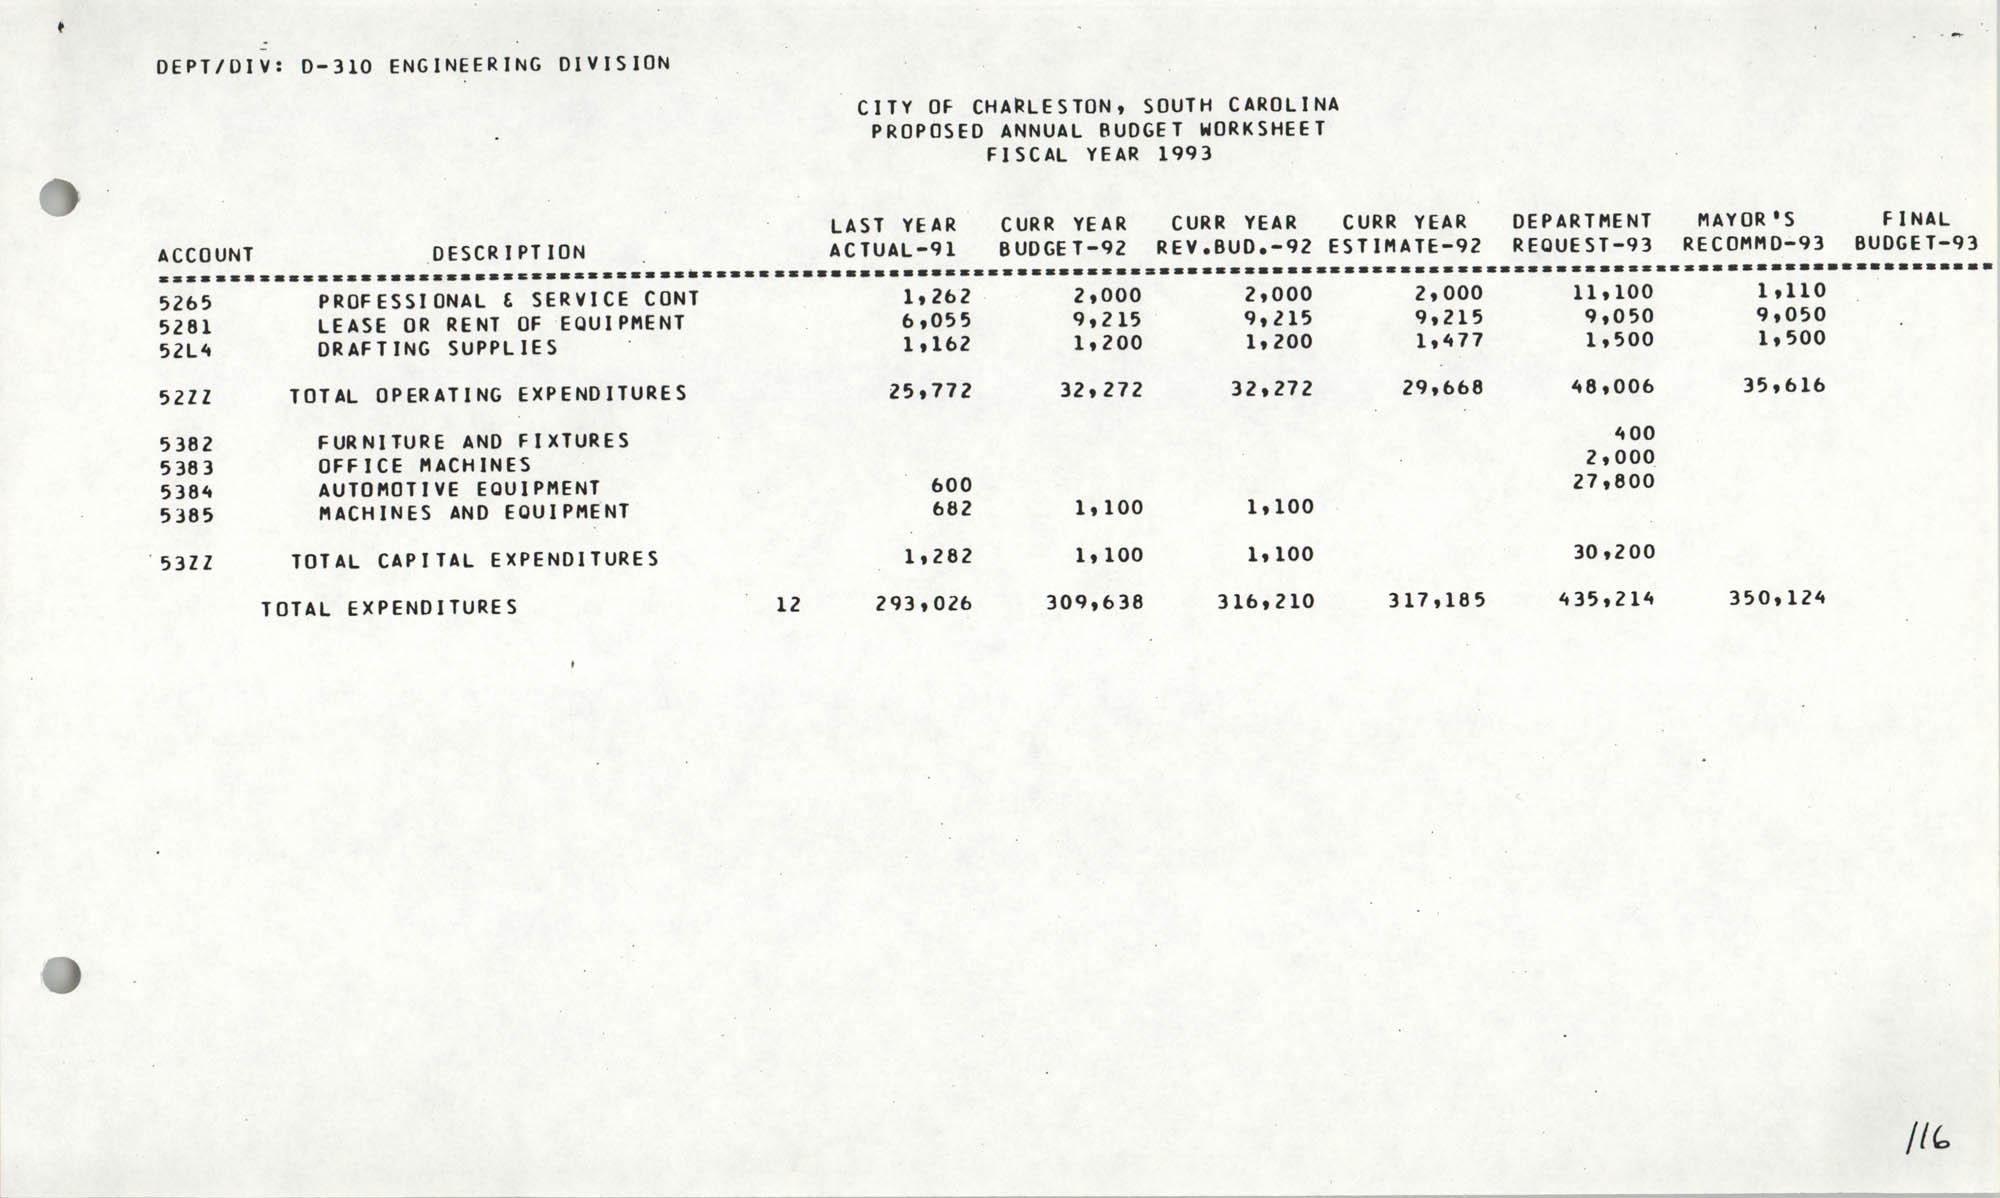 The City Council of Charleston, South Carolina, 1993 Budget, Page 116